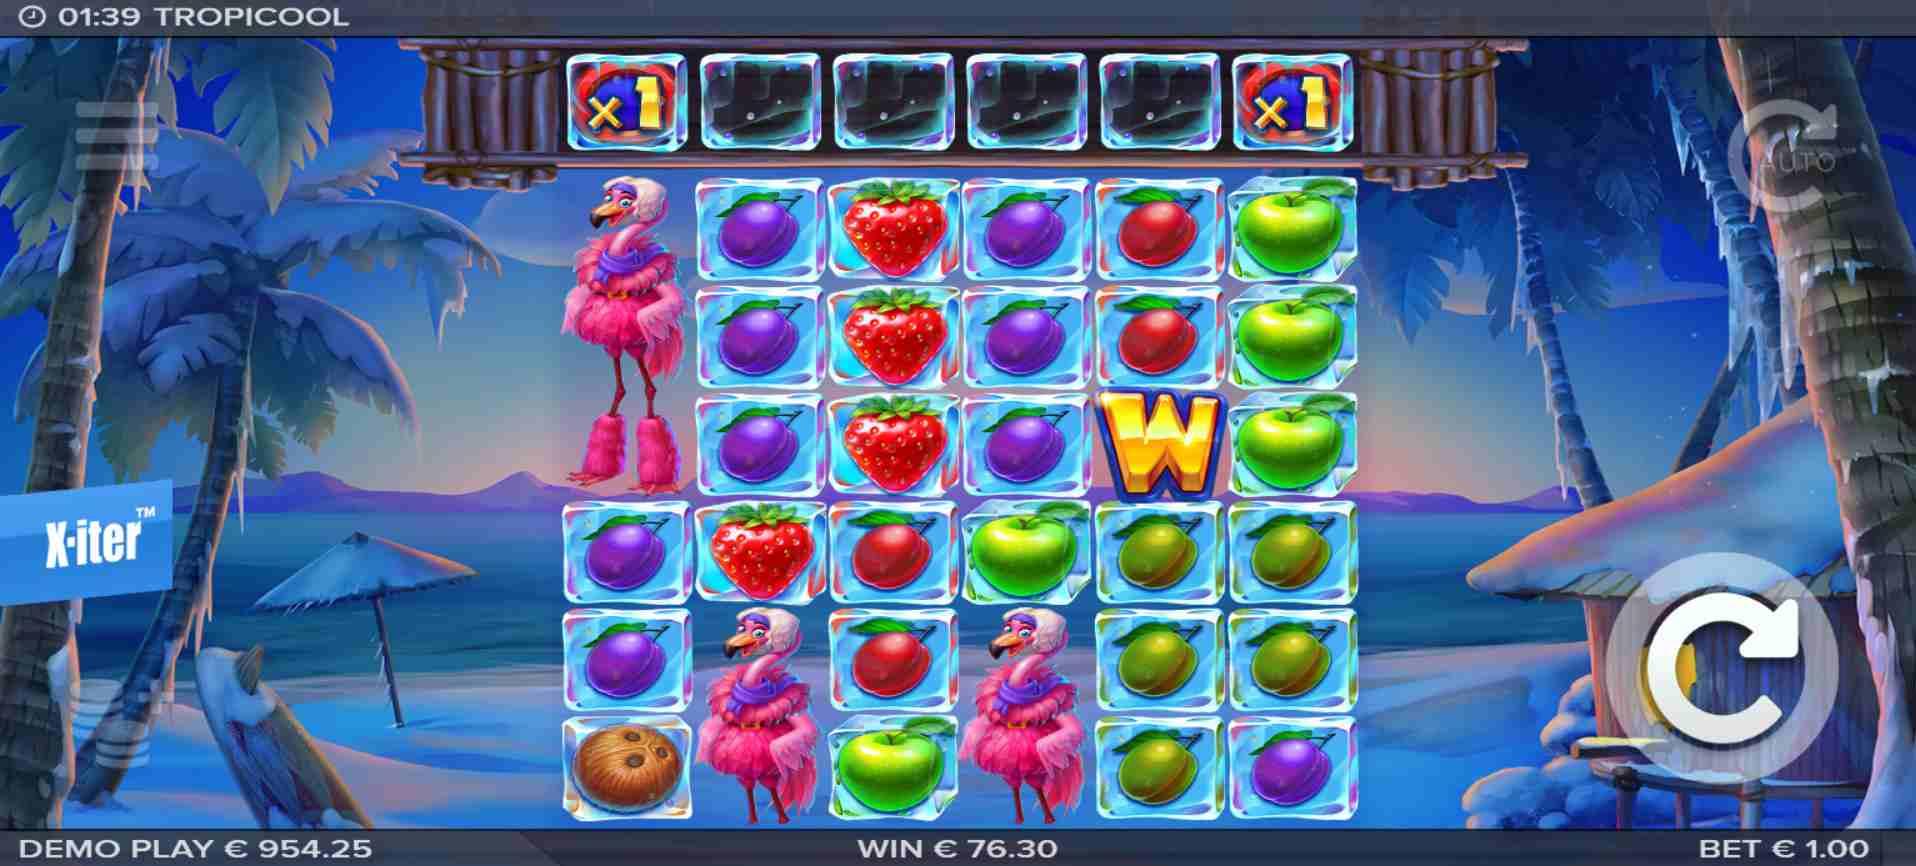 Tropicool Slot Base Game